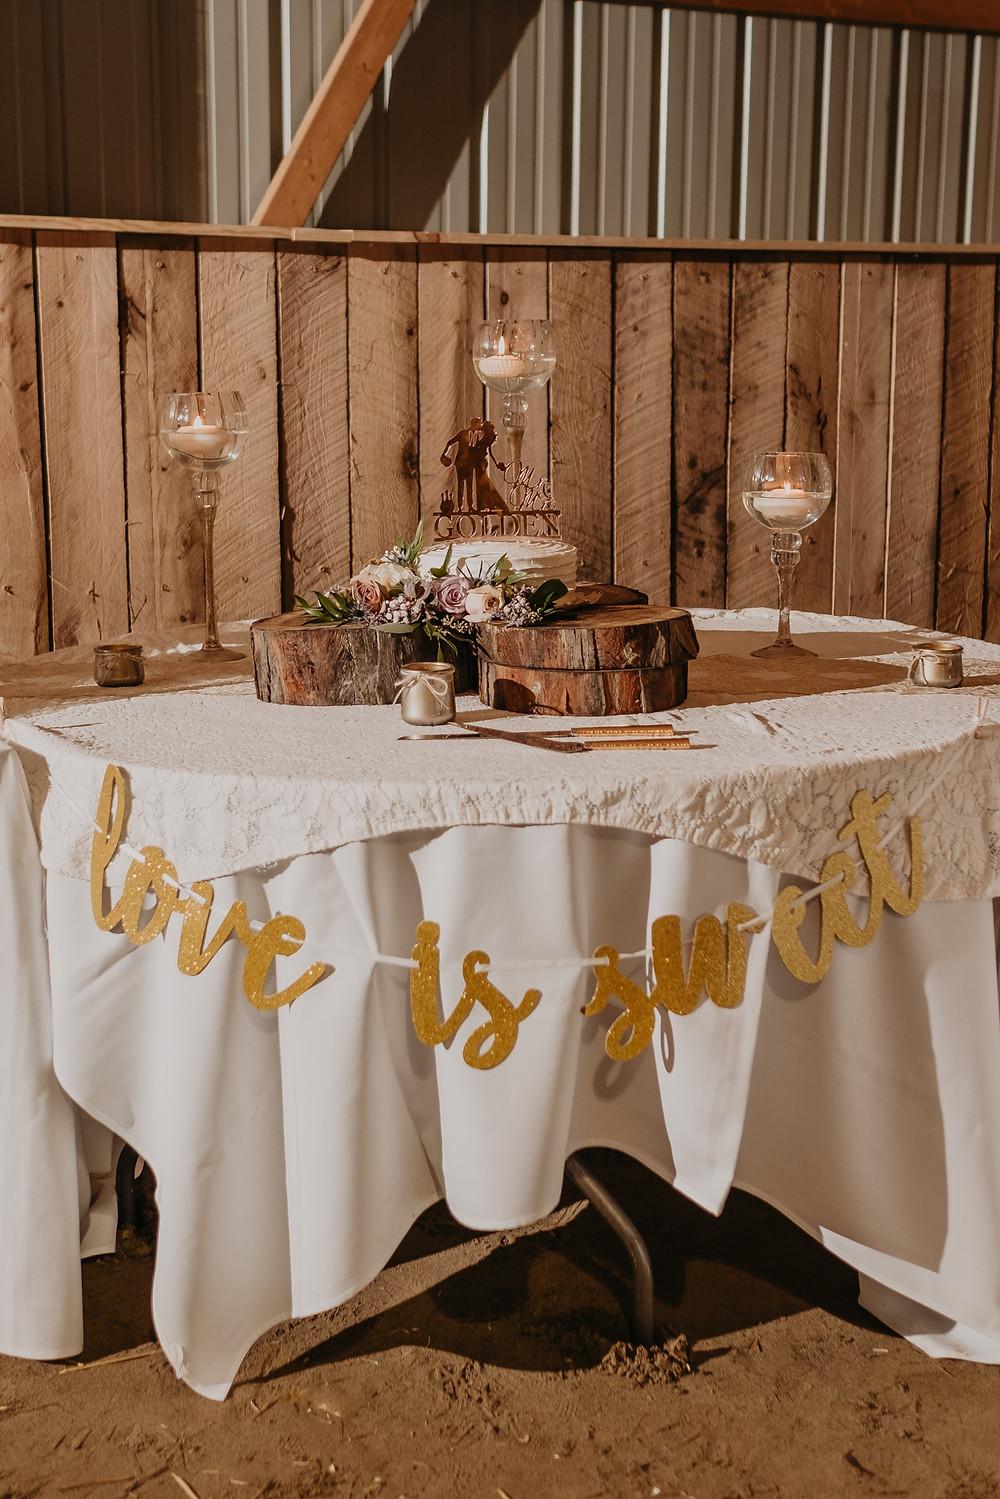 Michigan wedding cake table with barn and rustic decor